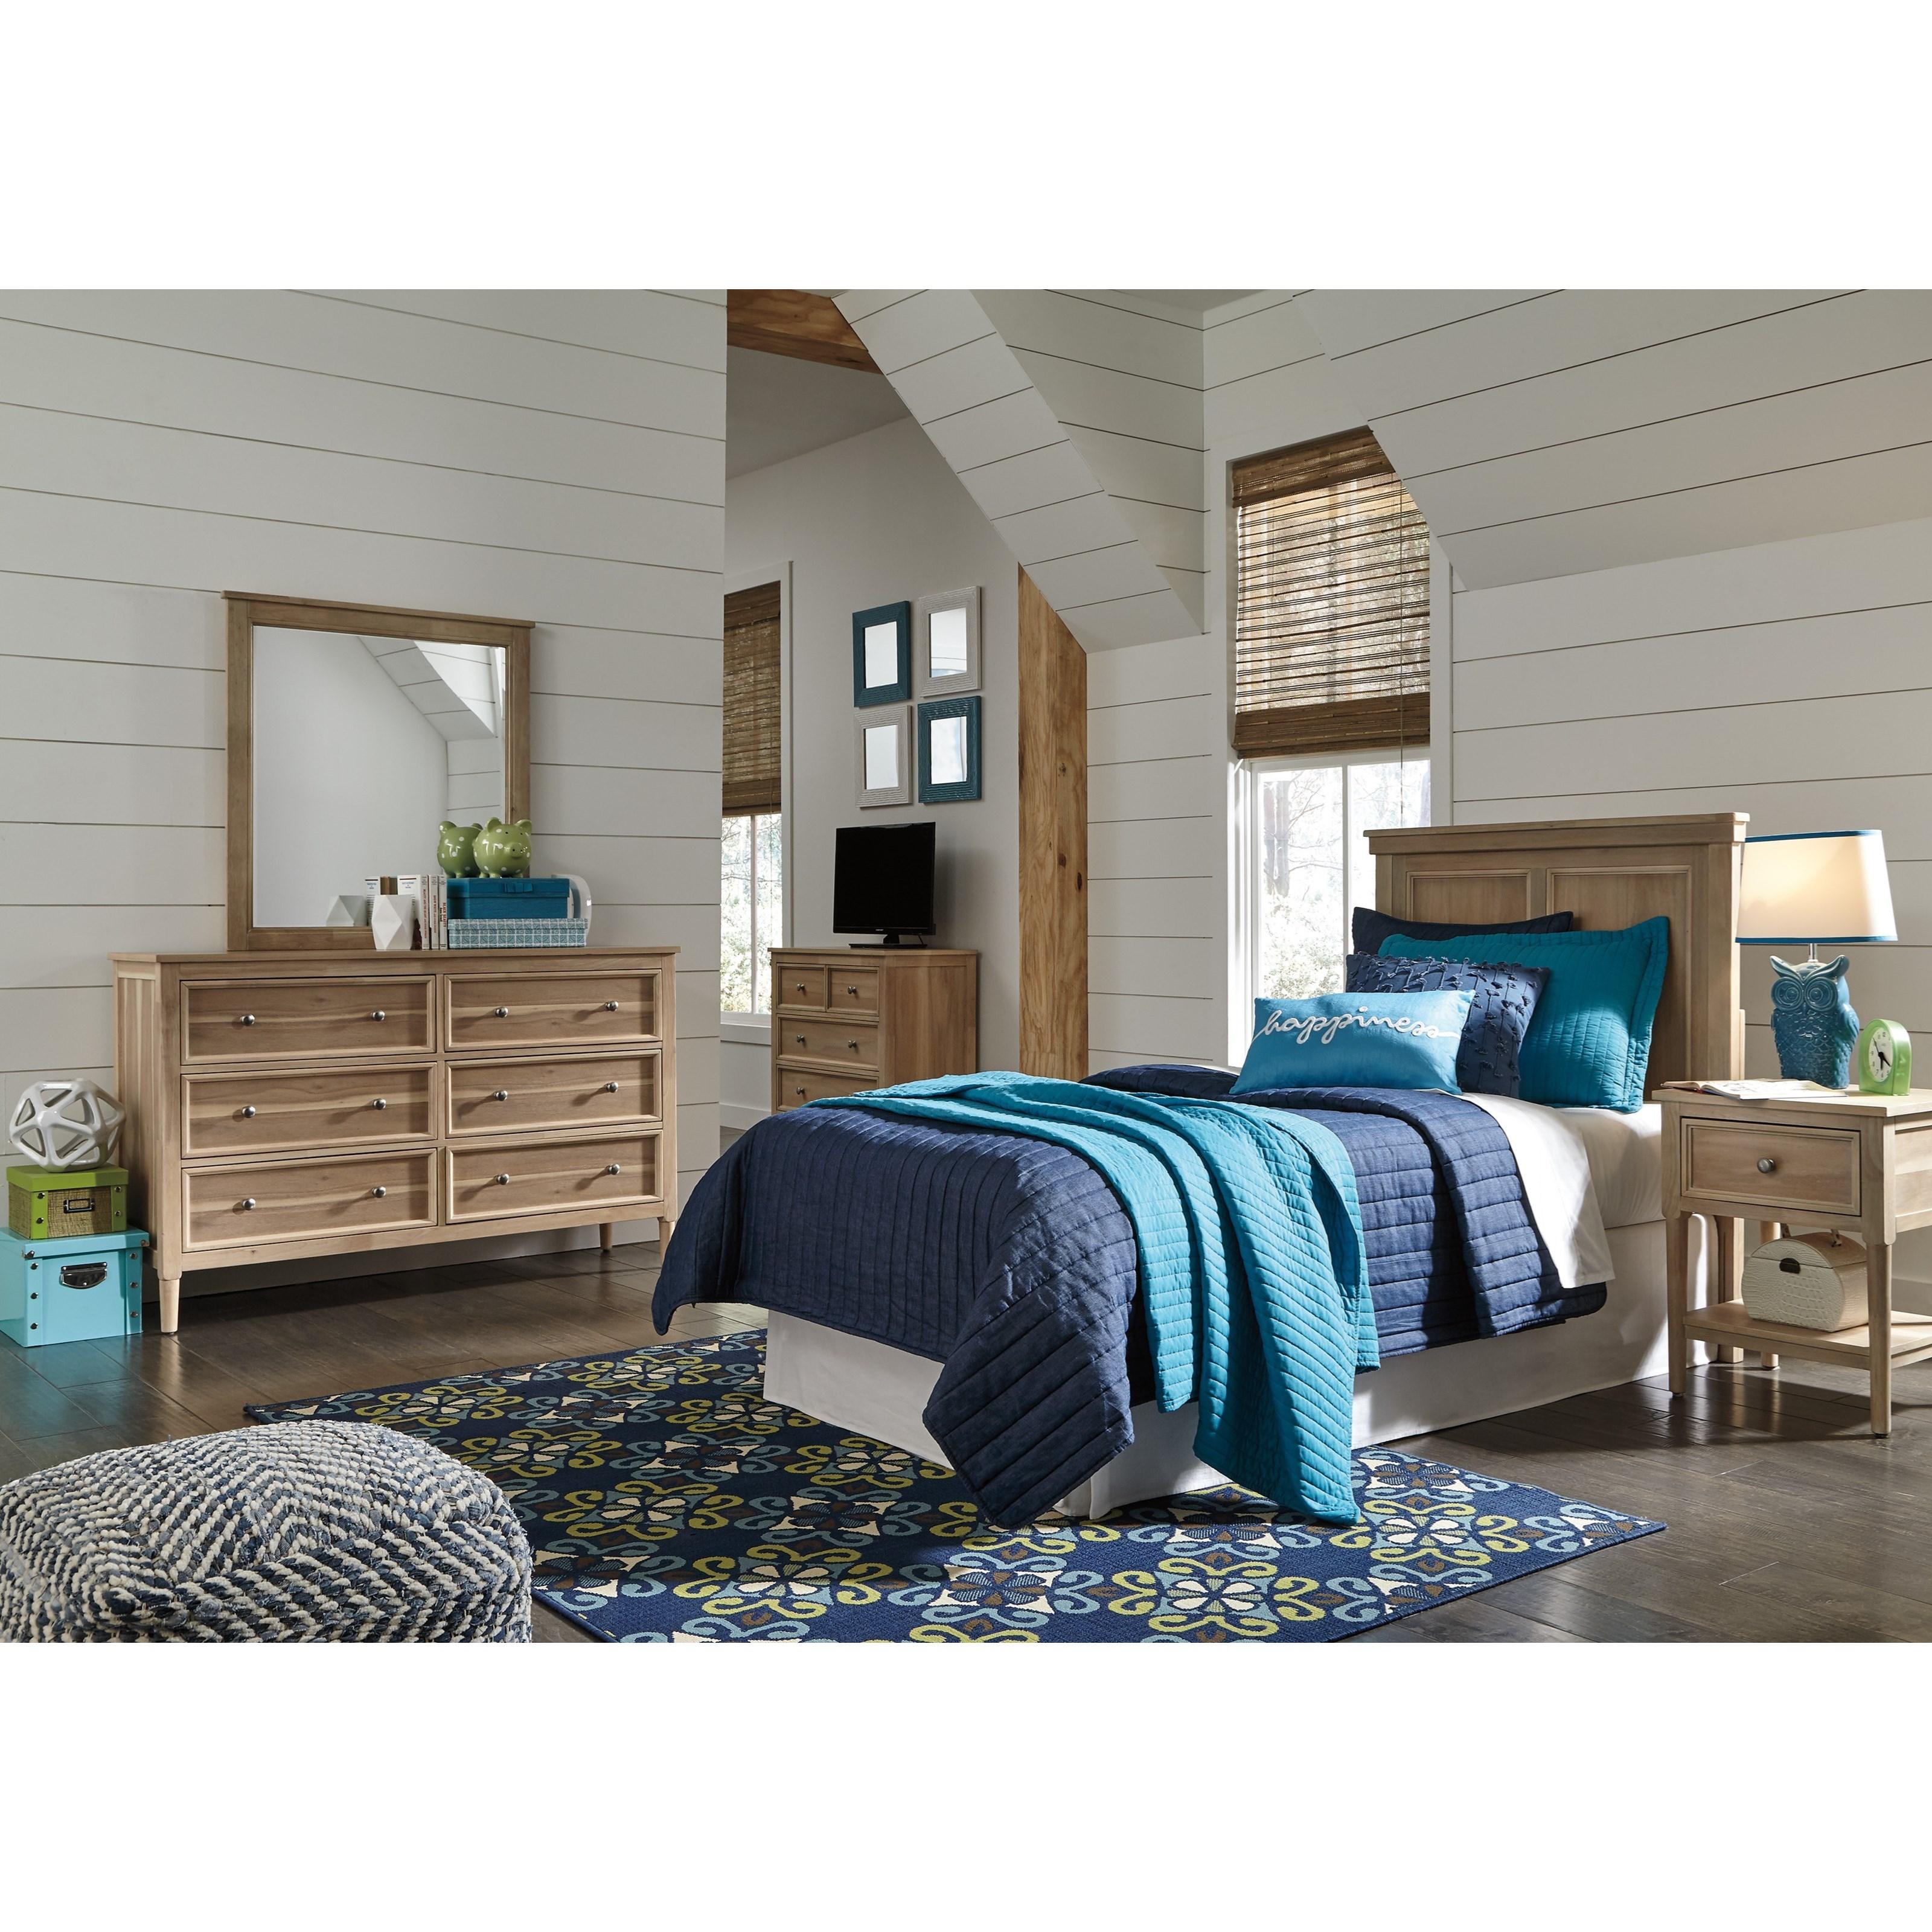 Signature Design by Ashley Klasholm Twin Bedroom Group - Item Number: B512 T Bedroom Group 3